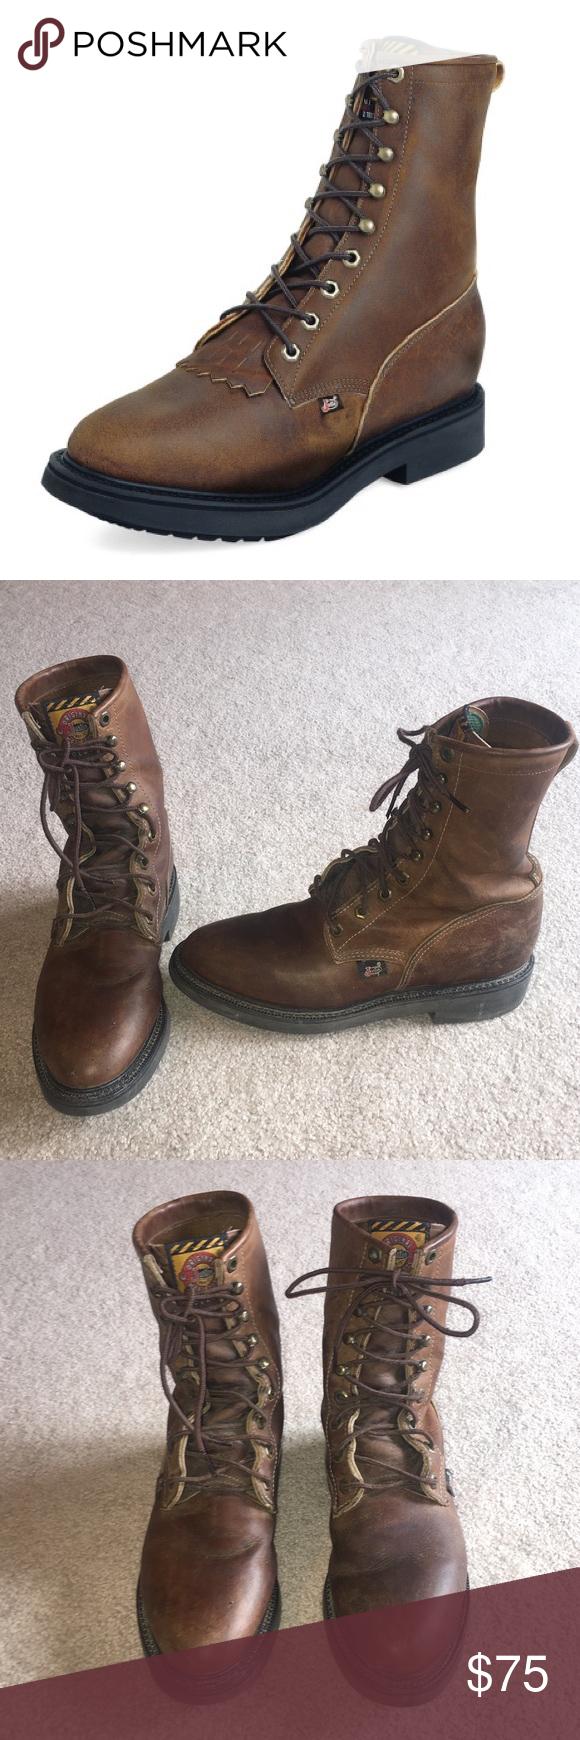 70d4c62ced5 Justin Lacer Original Work Boots Leather Brown 7 Justin Men's Lacer ...